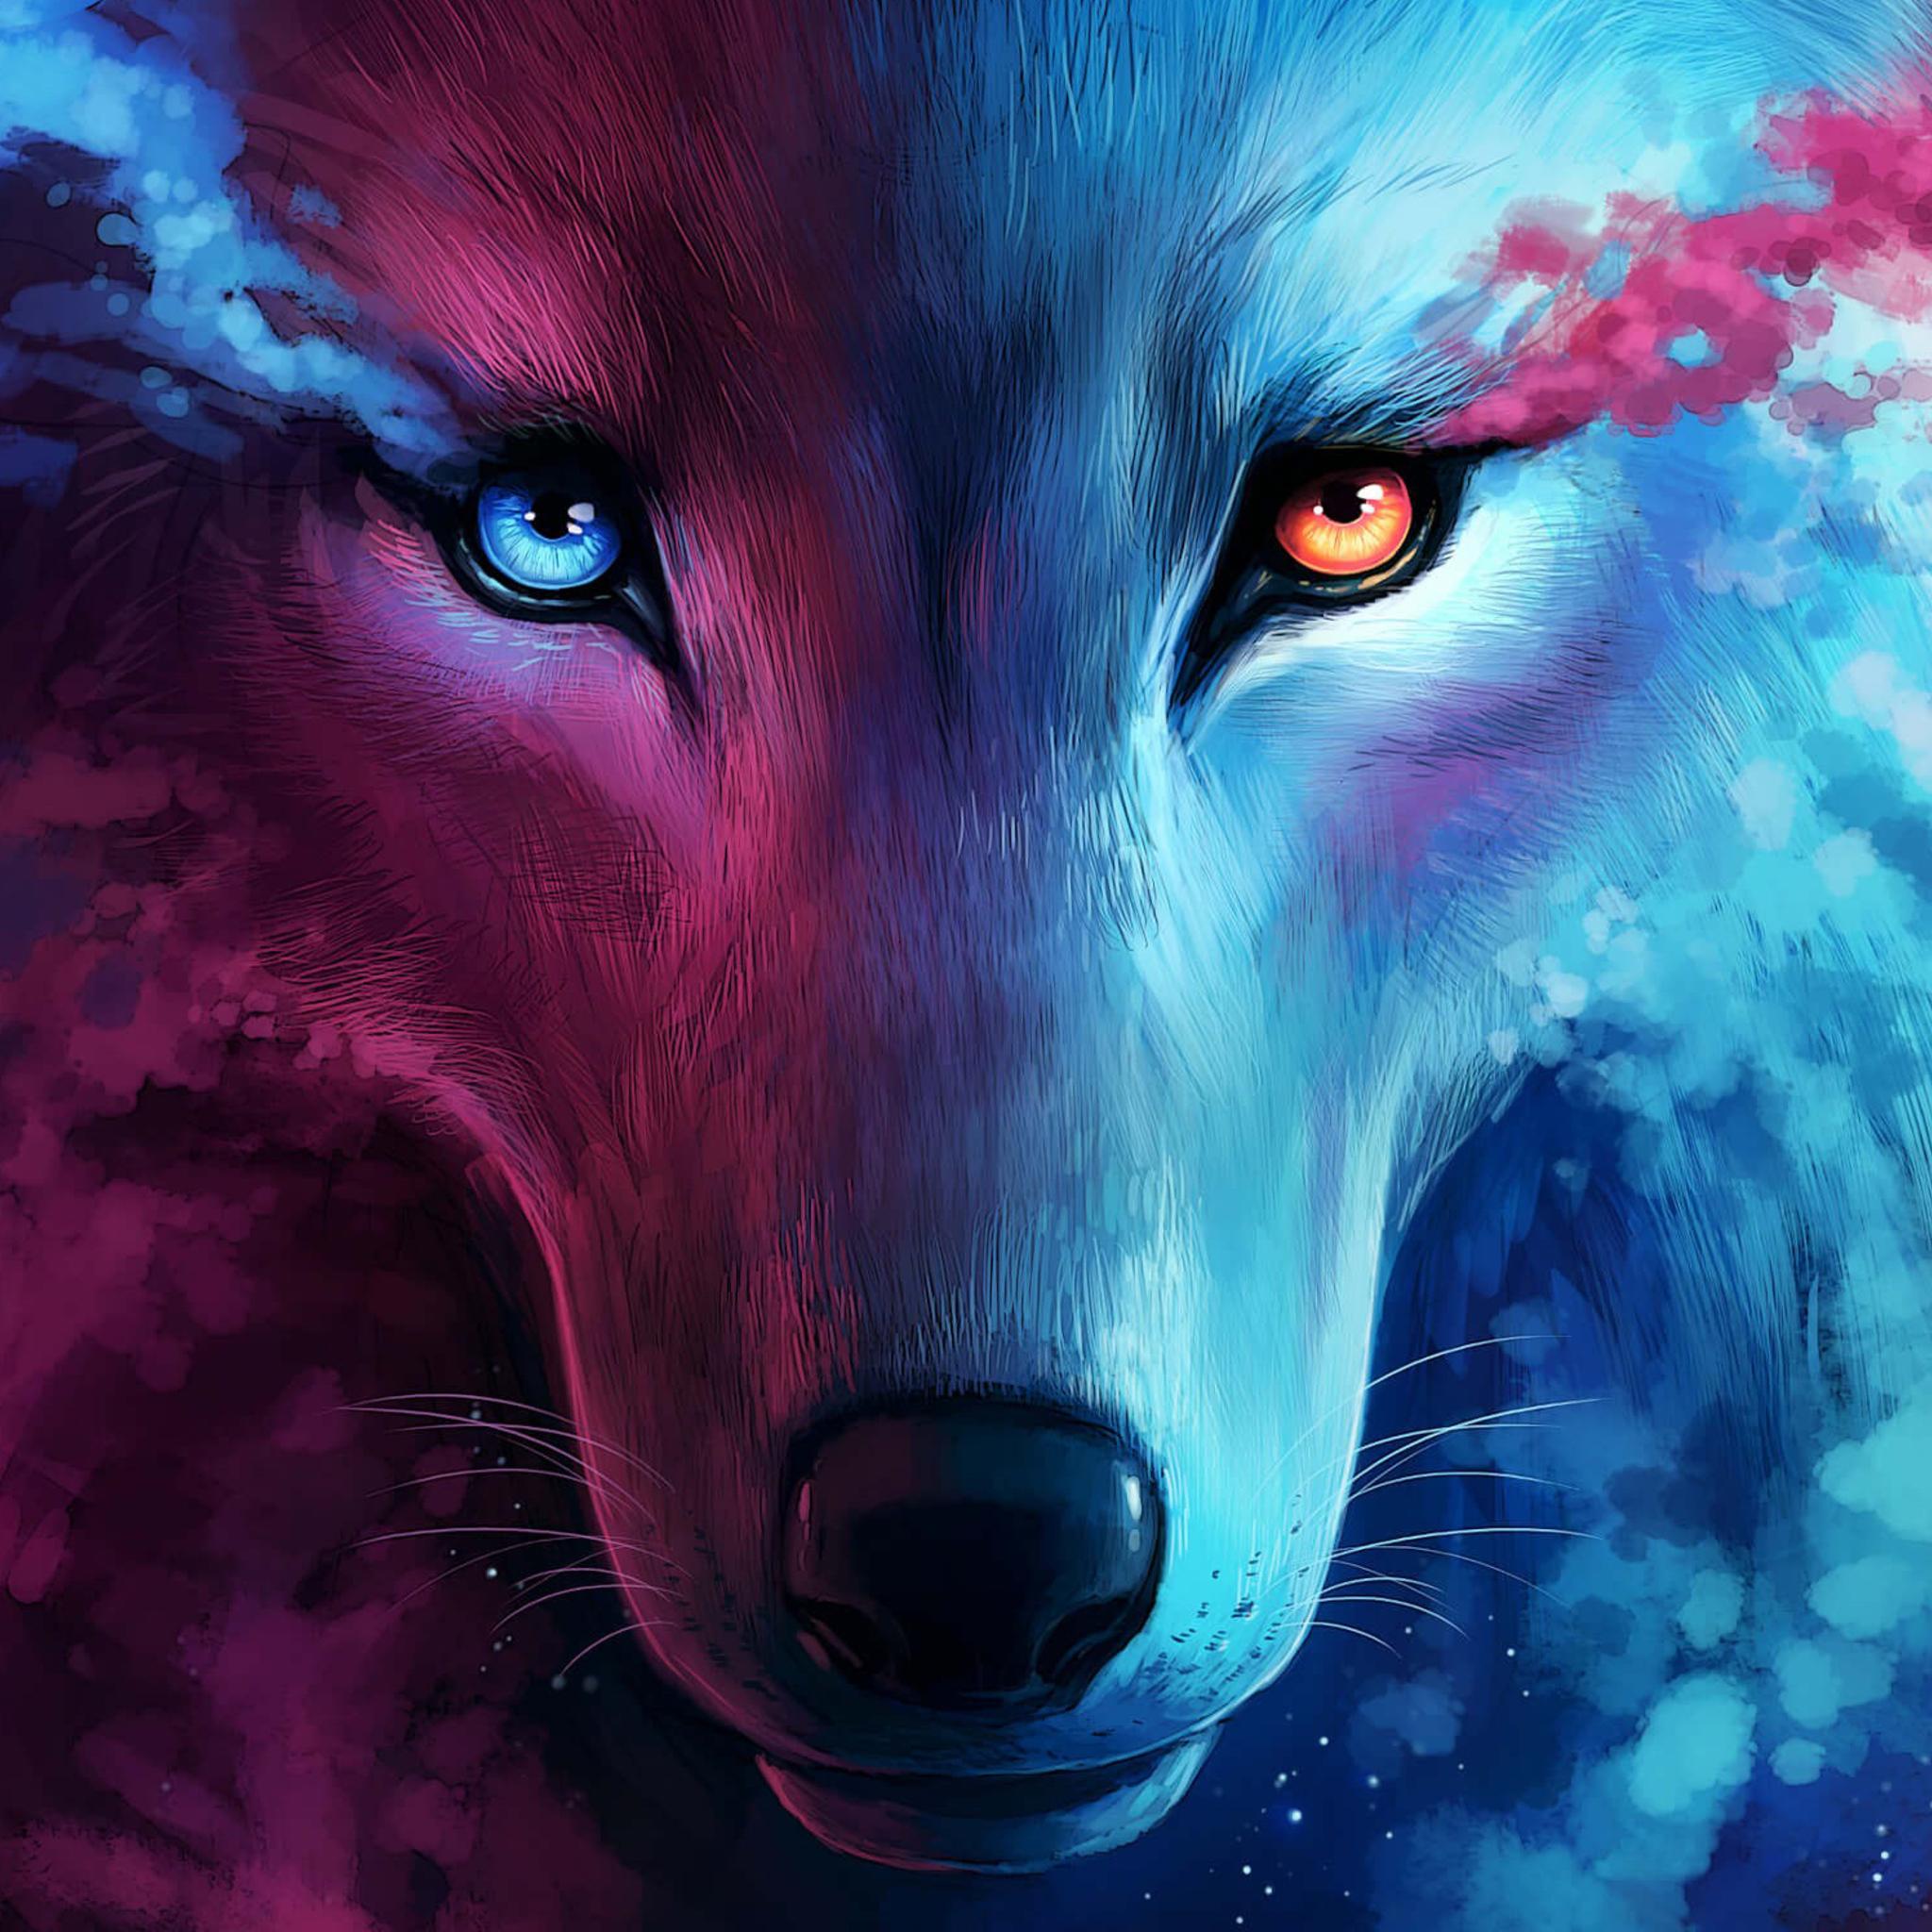 2048x2048 The Galaxy Wolf Ipad Air HD 4k Wallpapers